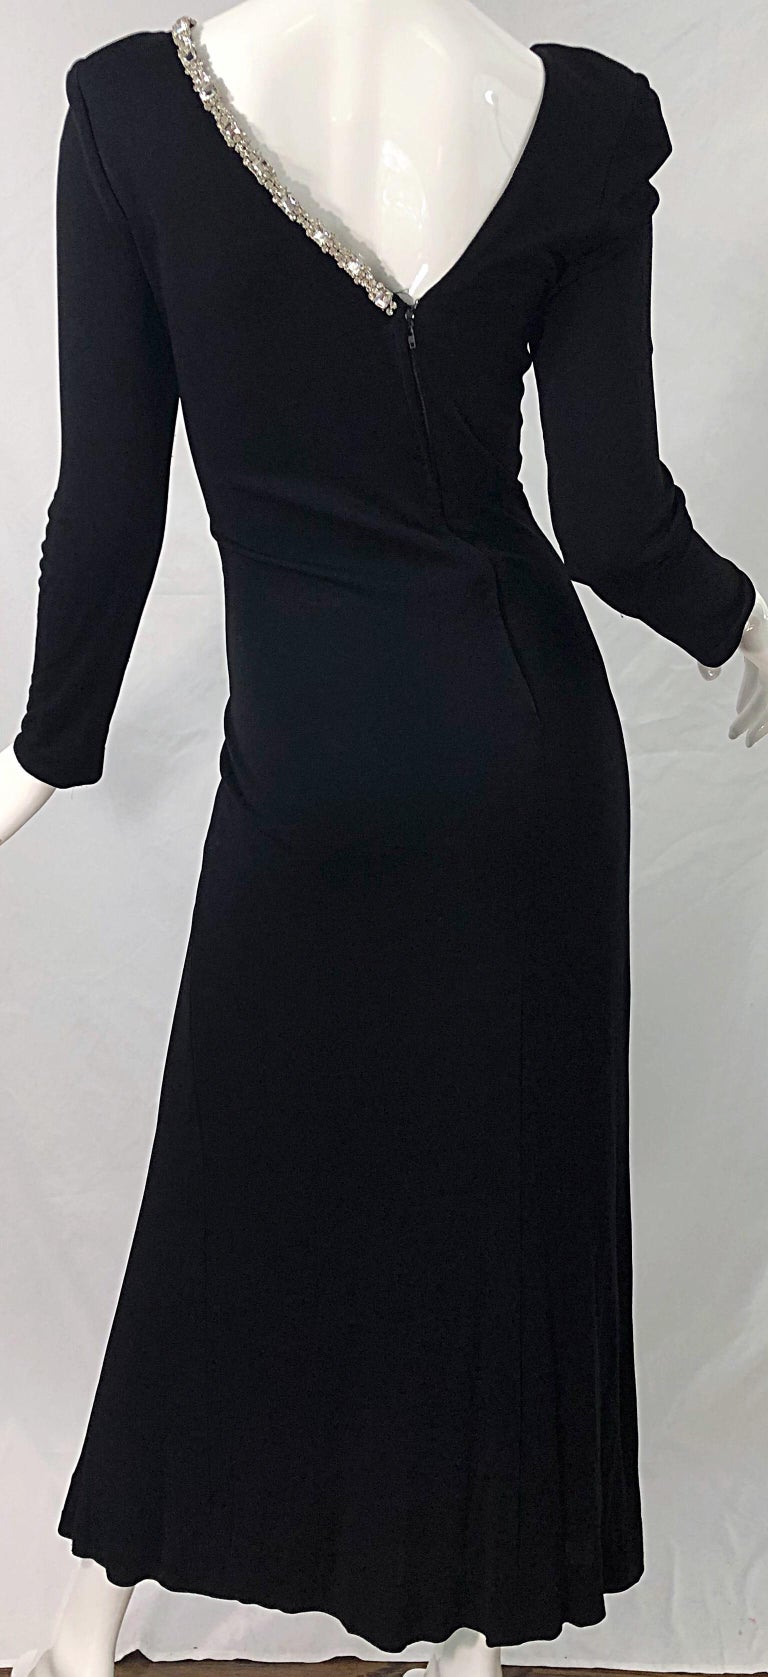 1980s Travilla Size 10 Black Matte Silk Jersey Rhinestone Vintage 80s Gown Dress For Sale 7